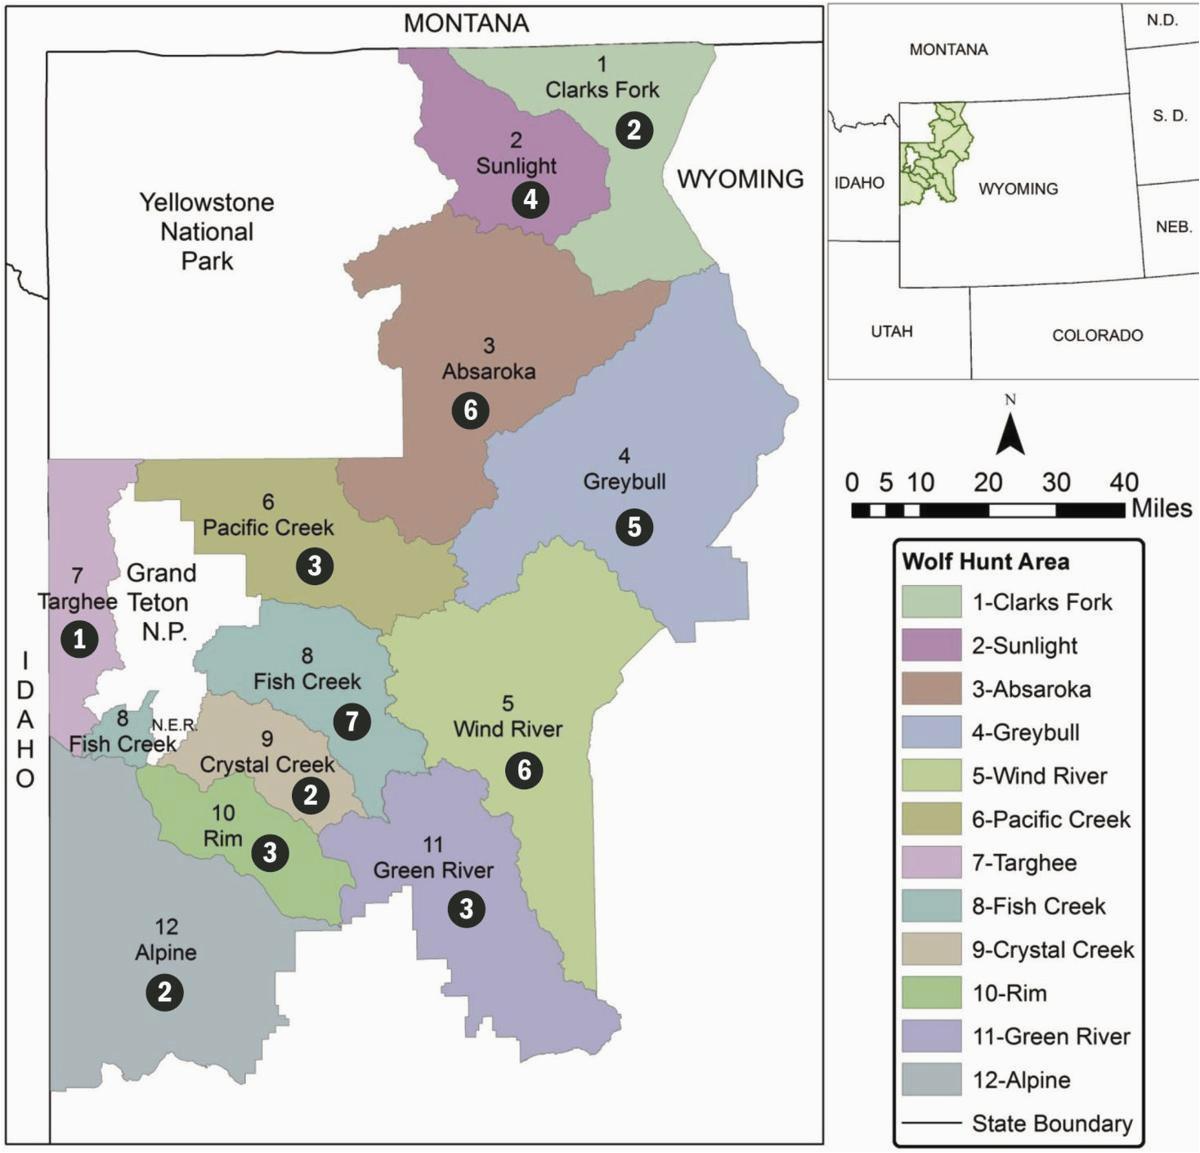 Maps Minnesota Pain Wyoming Sets Wolf Population Goal Of 160 Environmental